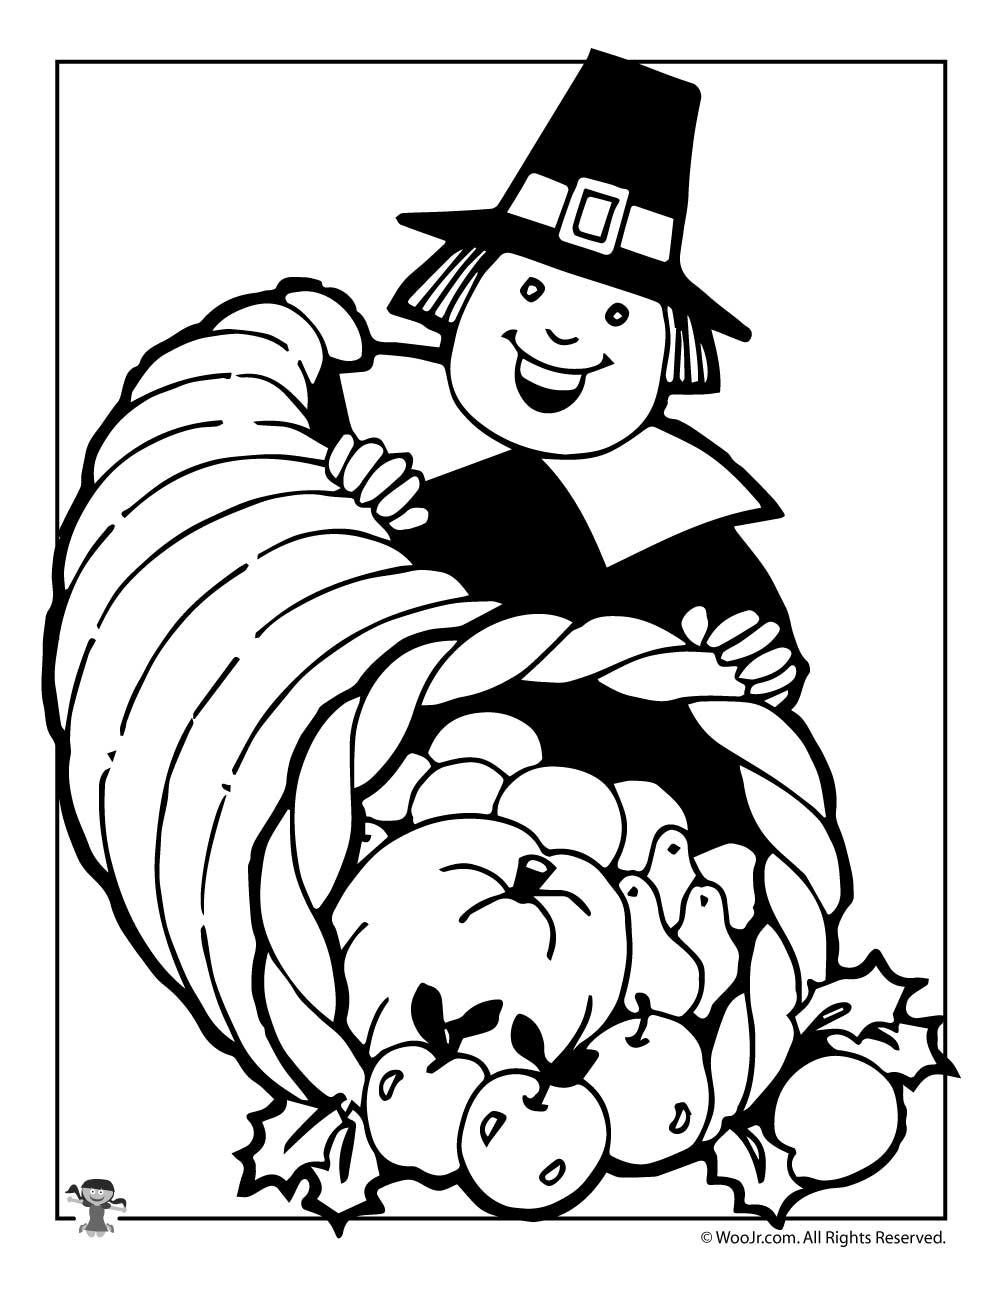 Thanksgiving Pilgrim Coloring Page | Woo! Jr. Kids Activities